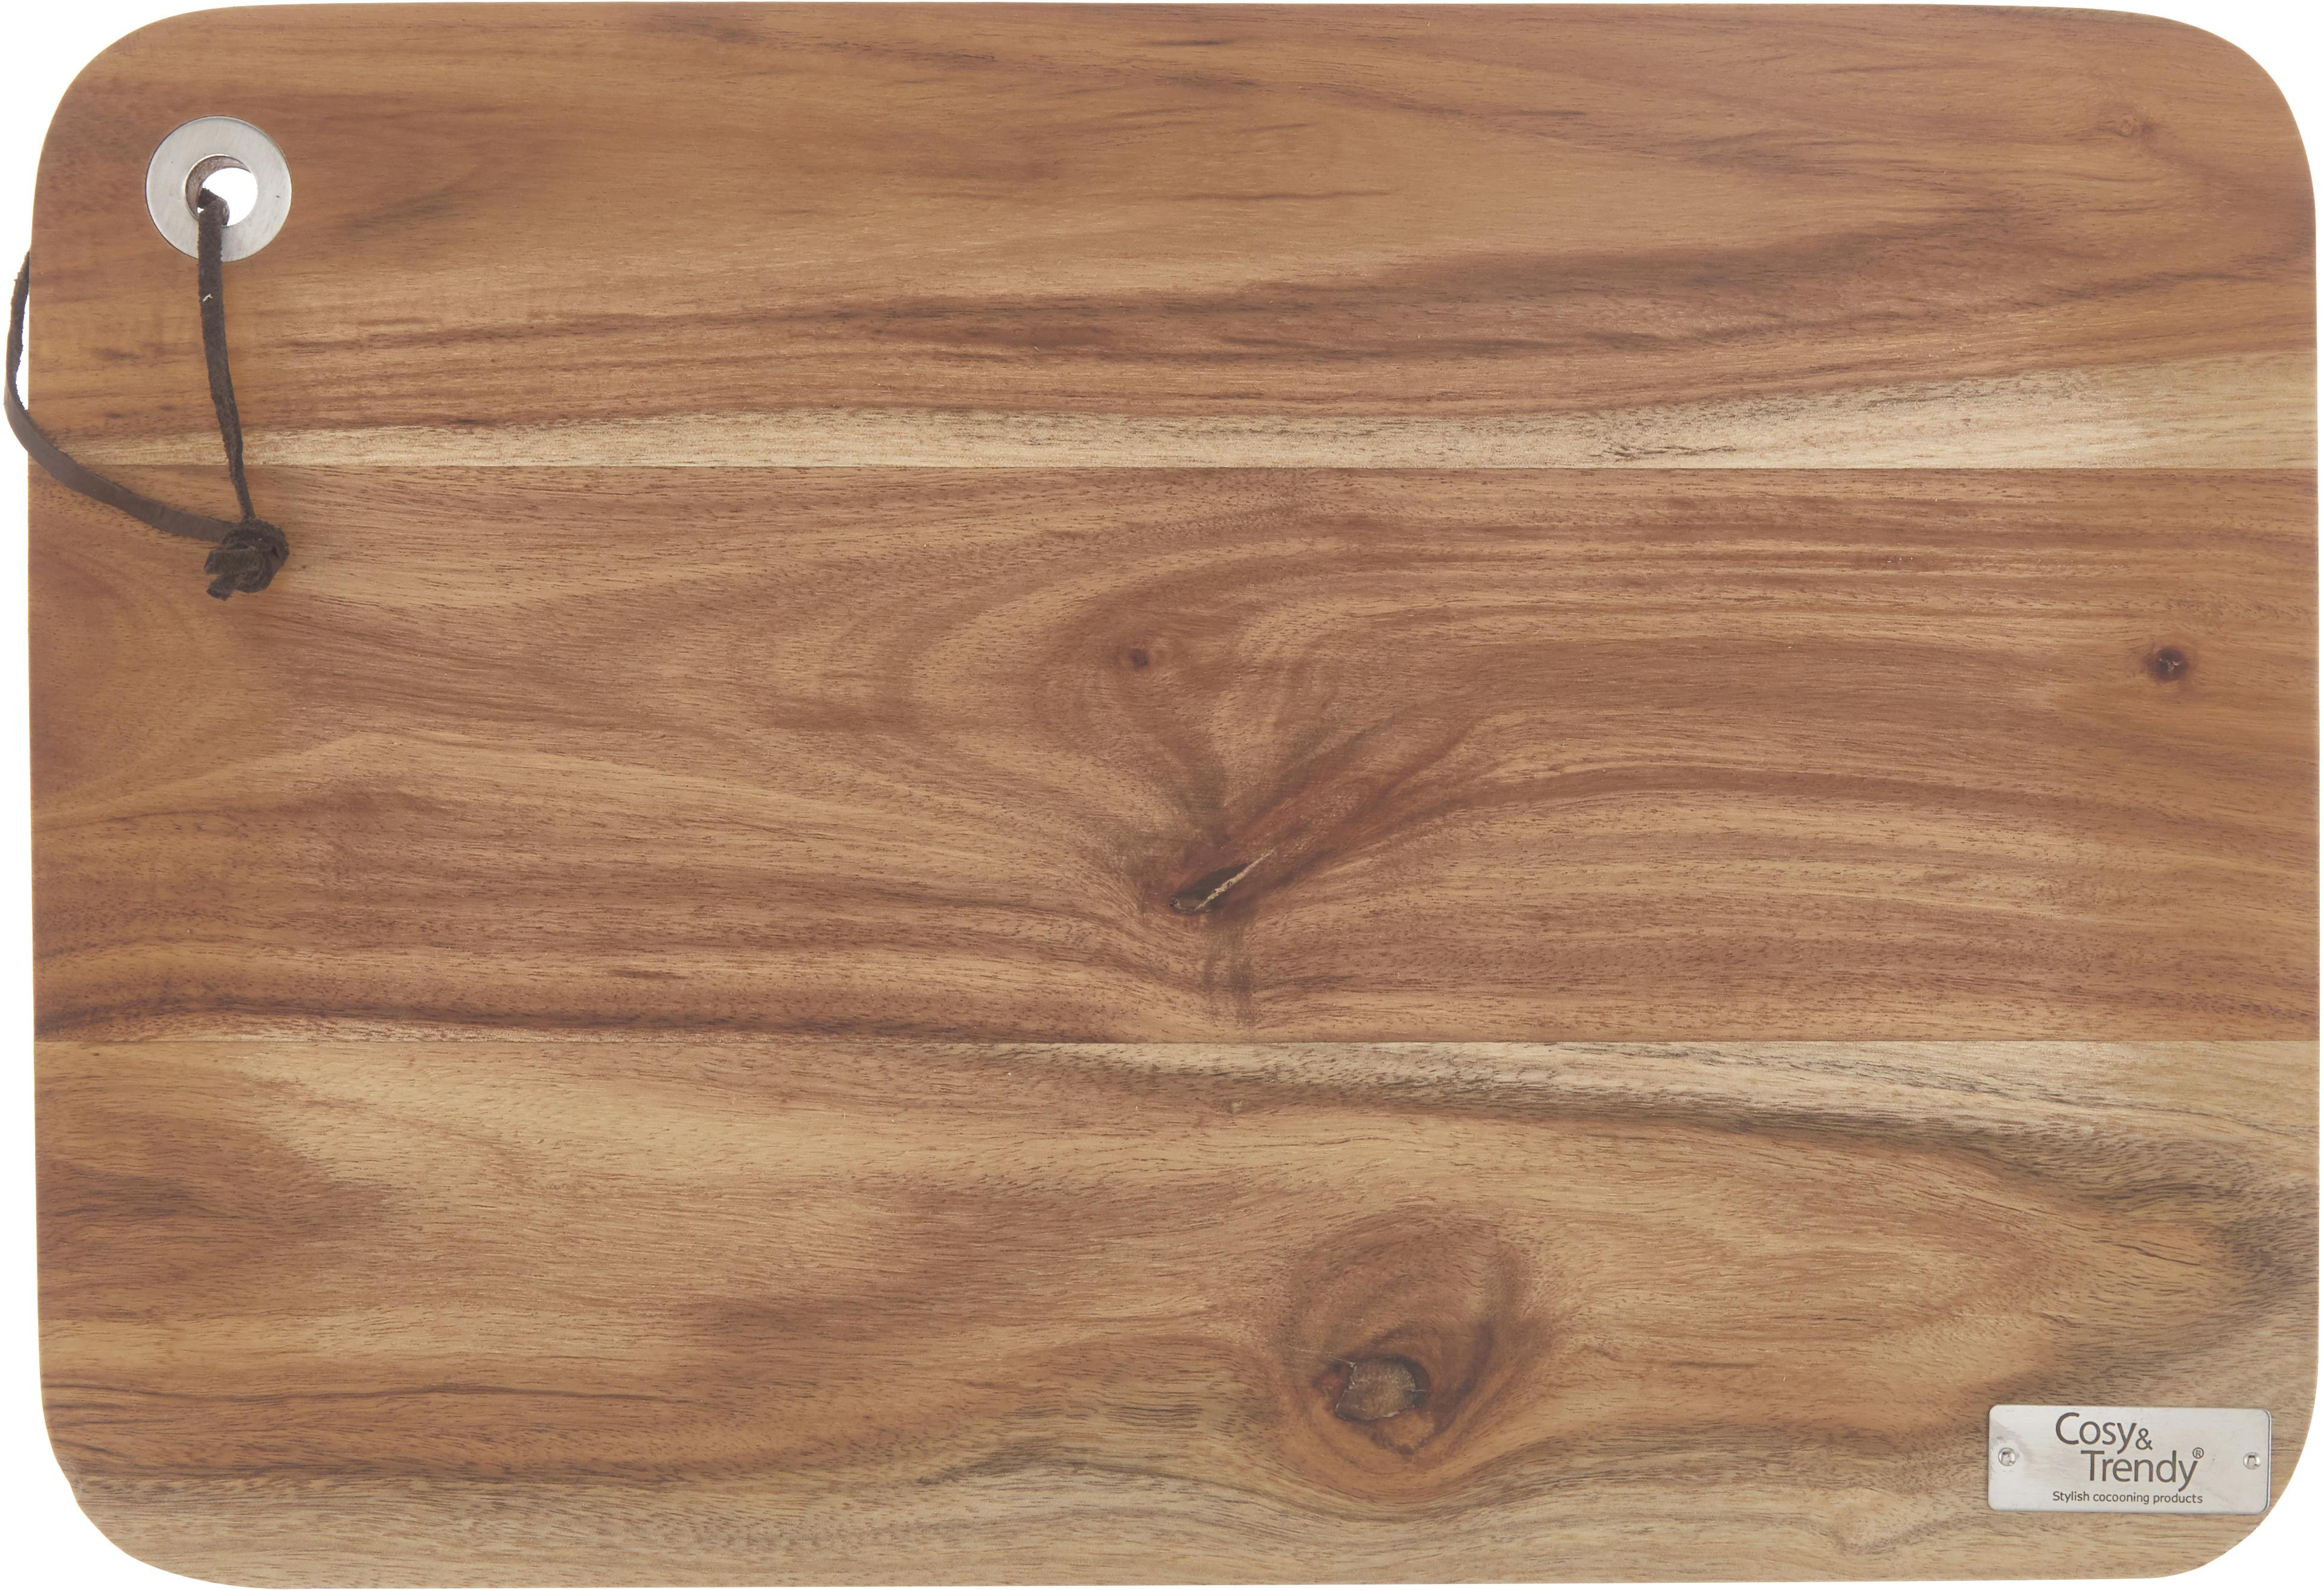 Snijplank Acacia, Acaciahout, Acaciahoutkleurig, B 33 x D 23 cm